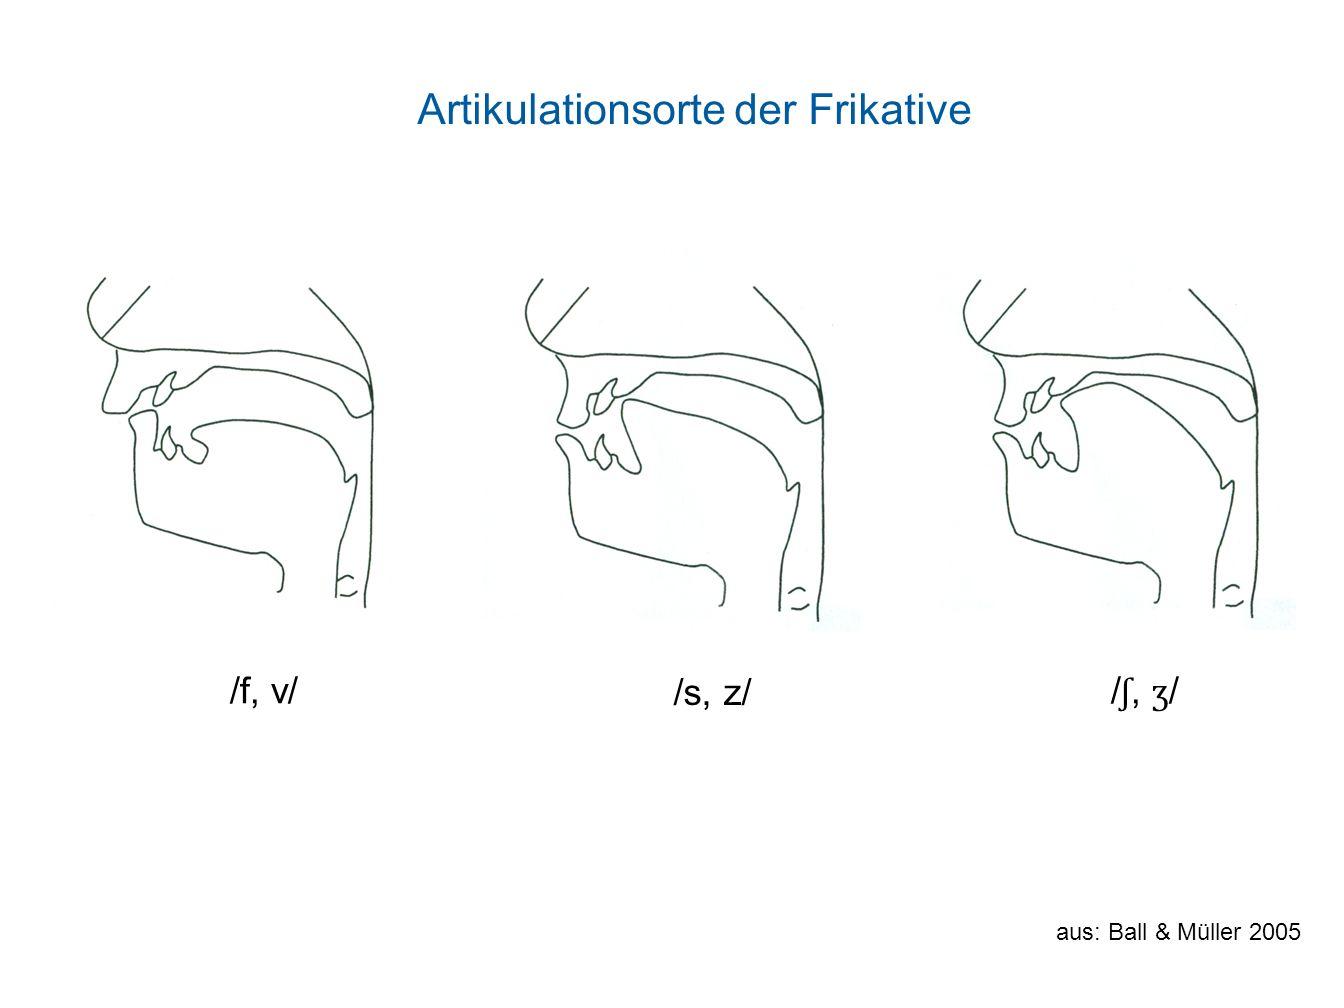 Artikulationsorte der Frikative /f, v/ /s, z/ / ʃ, ʒ / aus: Ball & Müller 2005